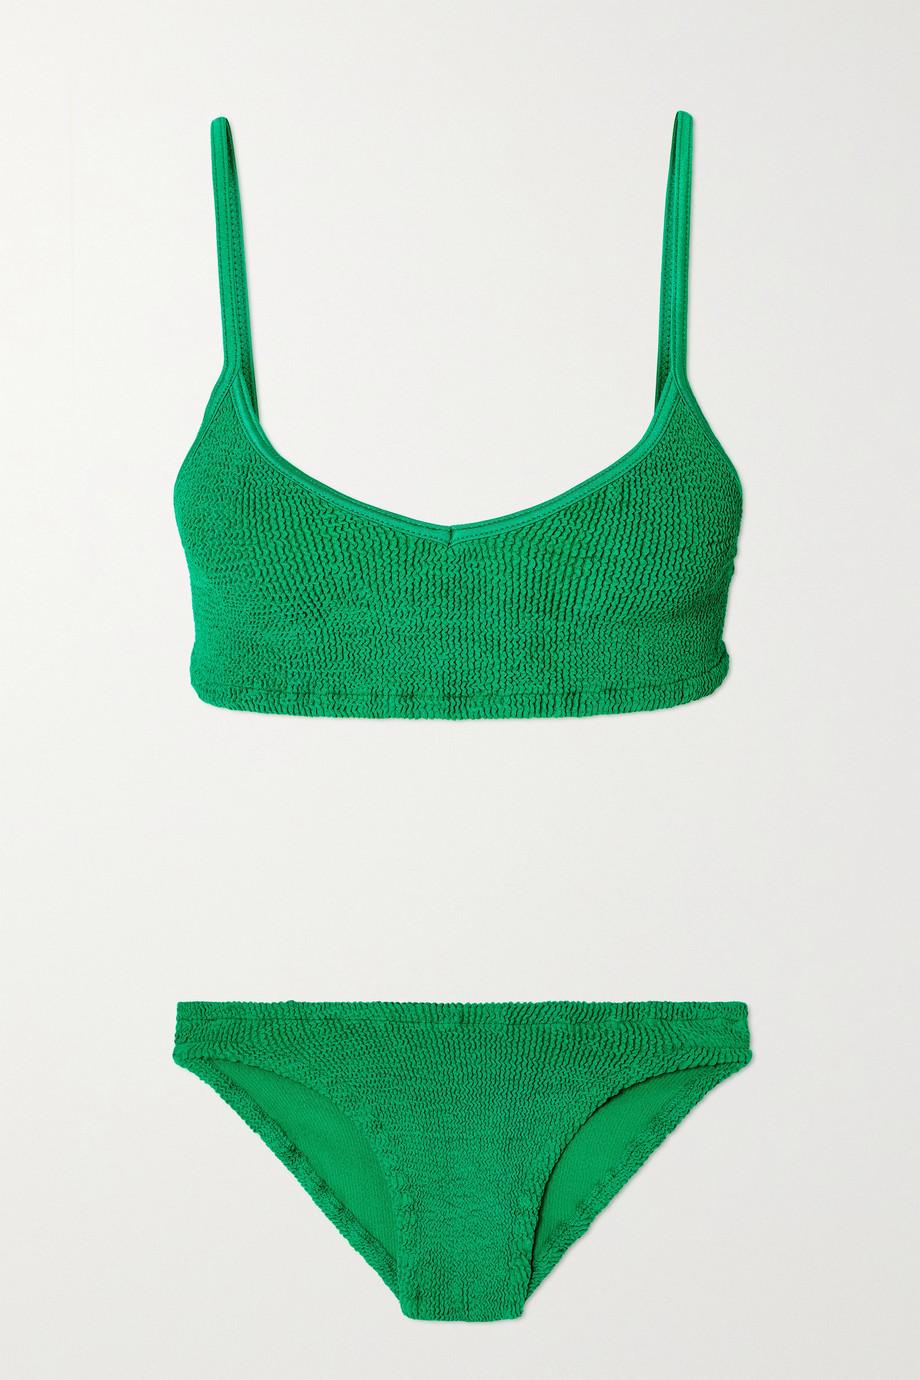 Hunza G + NET SUSTAIN Virginia seersucker bikini